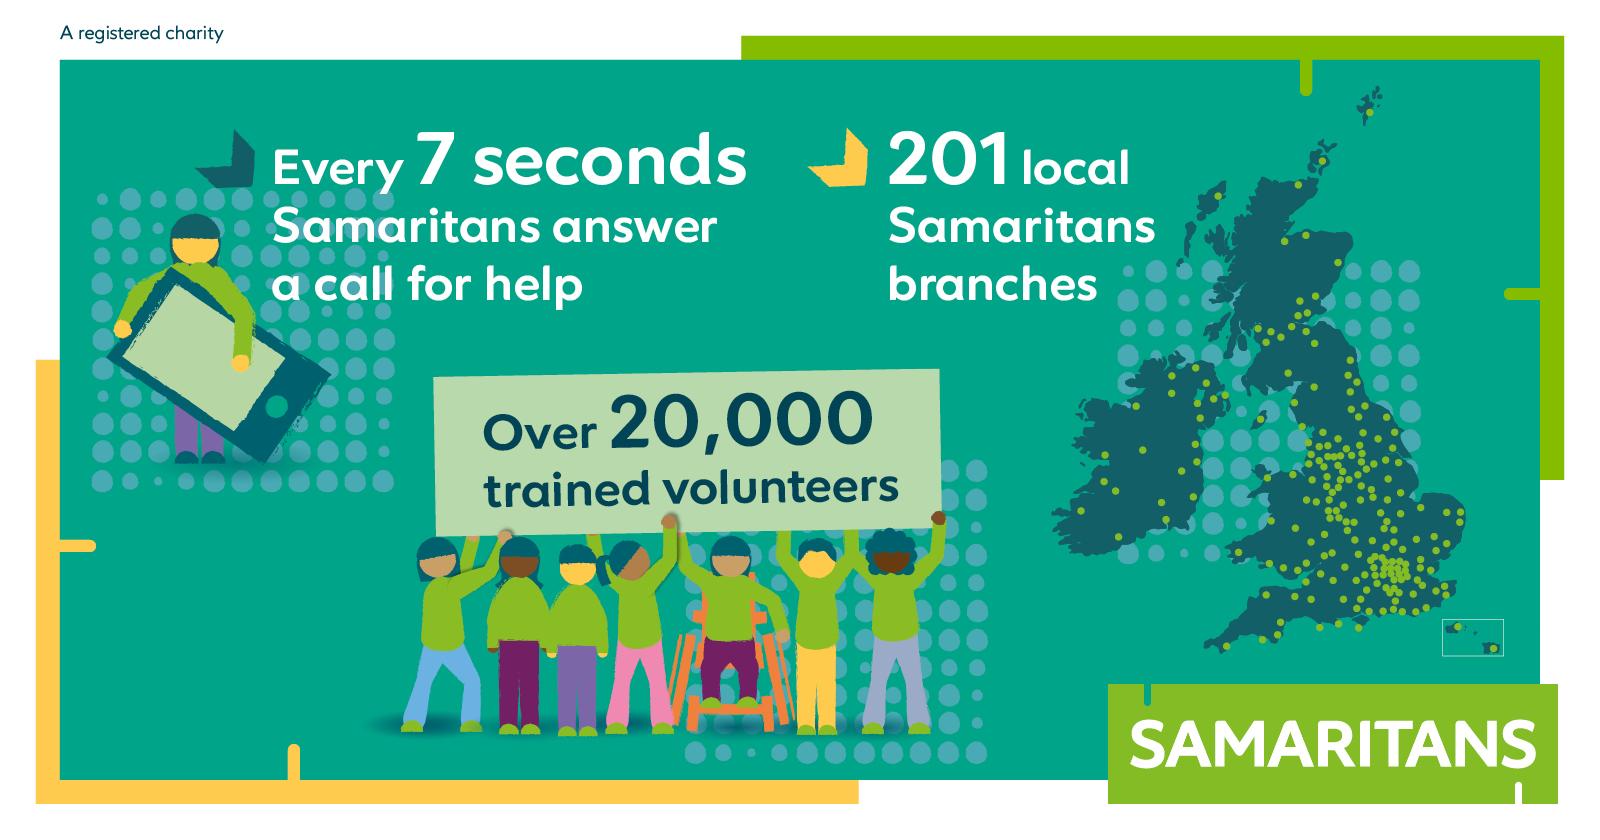 About Samaritans - infographic